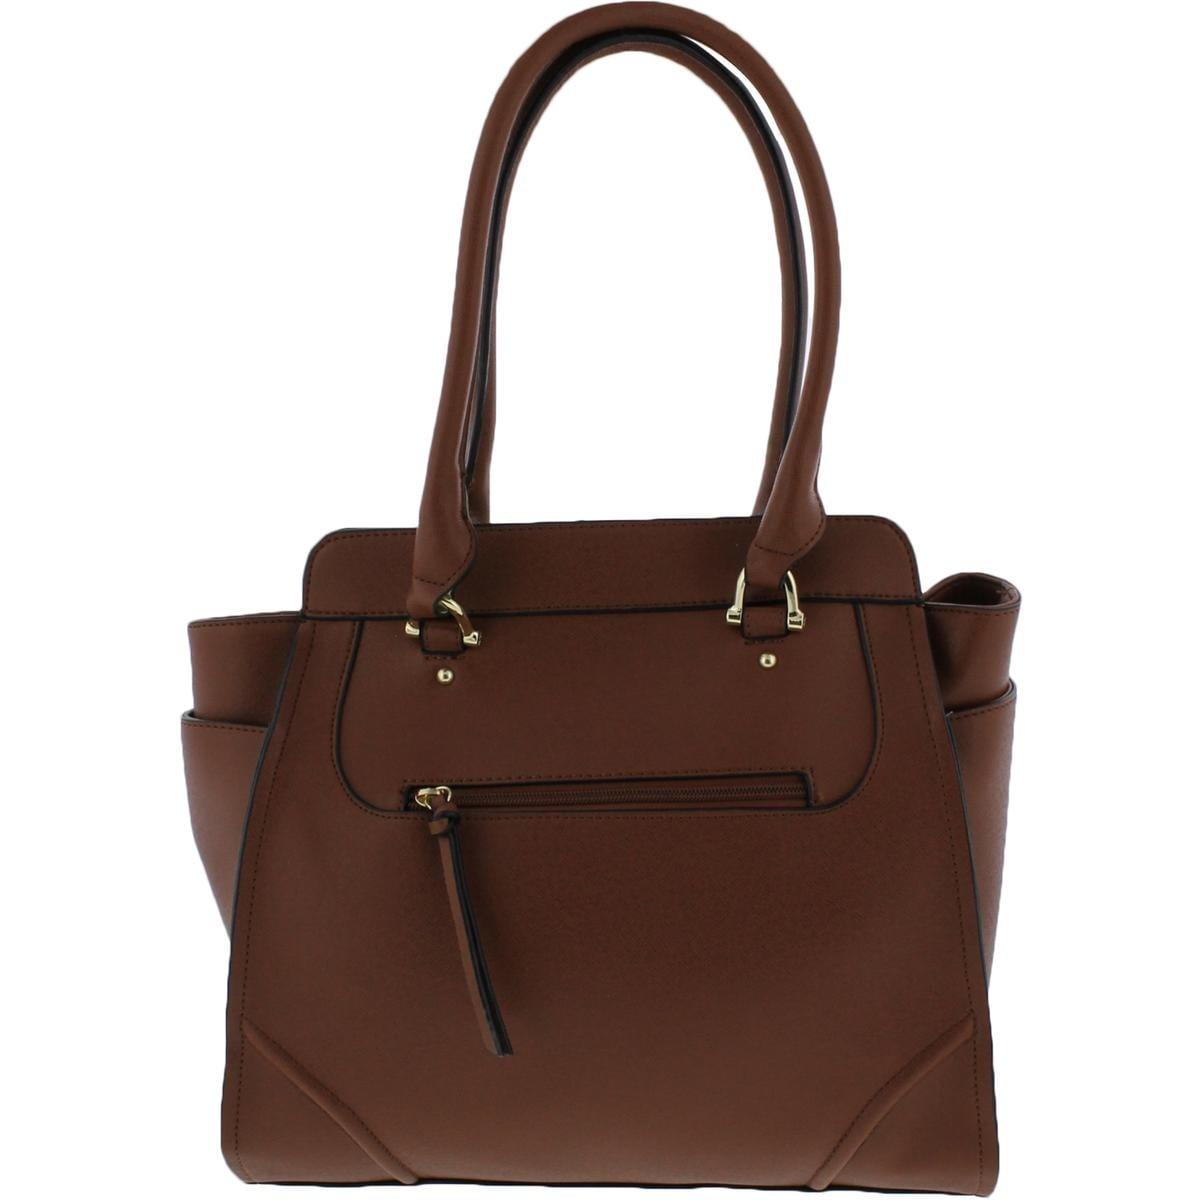 London Fog Womens Sophia Tote Handbag Signature Textured Large Free Shipping On Orders Over 45 20619848